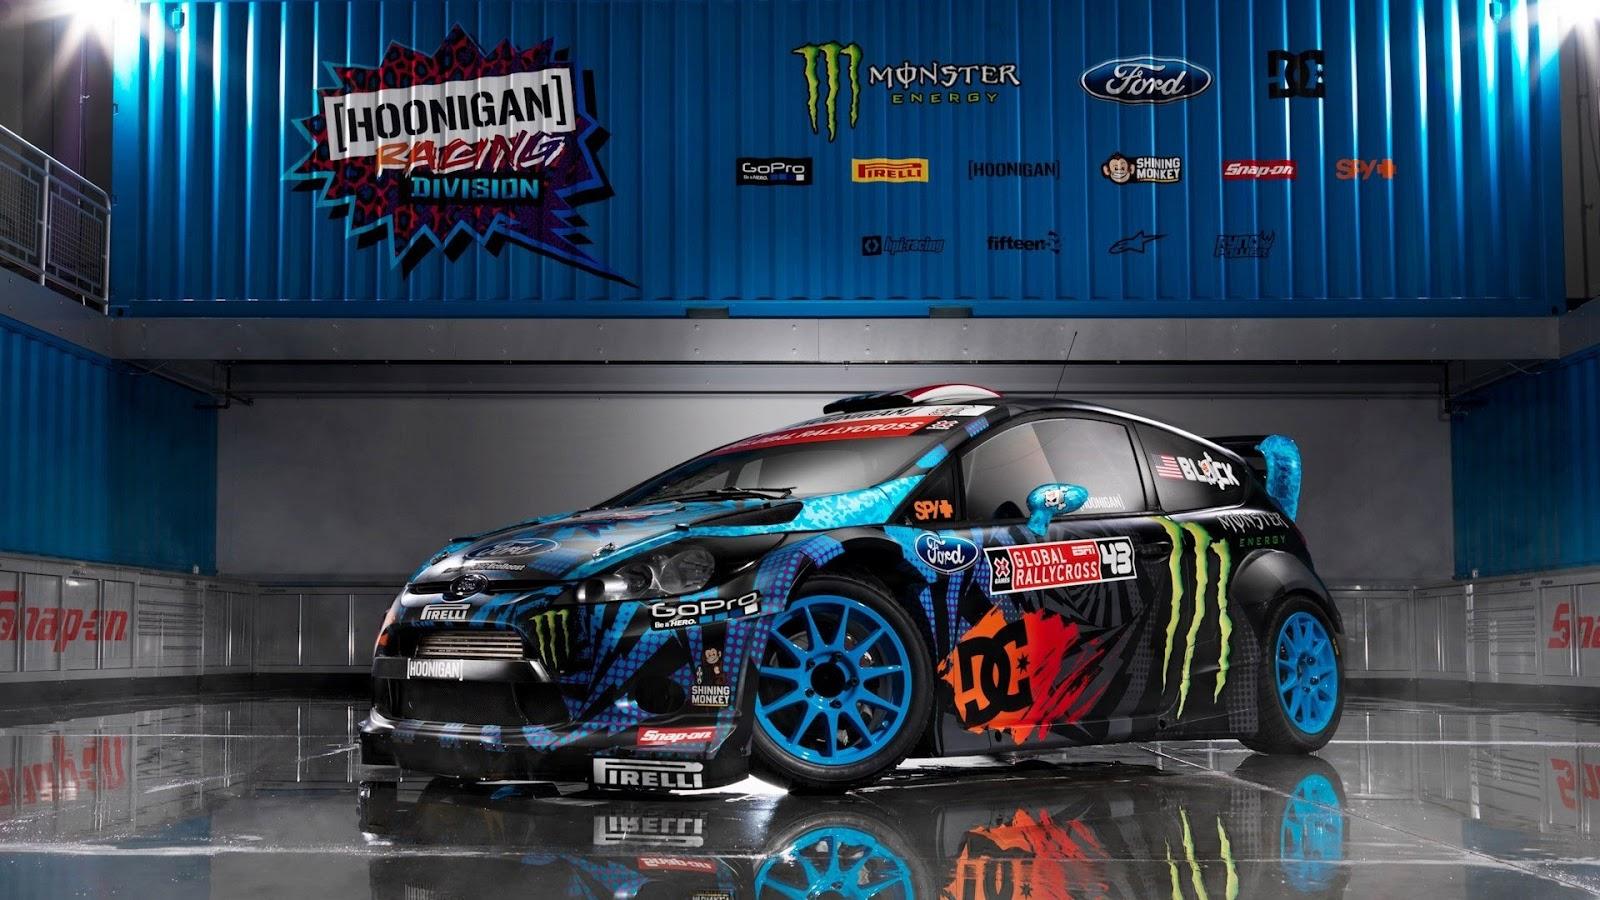 Ford fiesta monster ken block hd wallpaper covers heat - Ken hd wallpaper ...